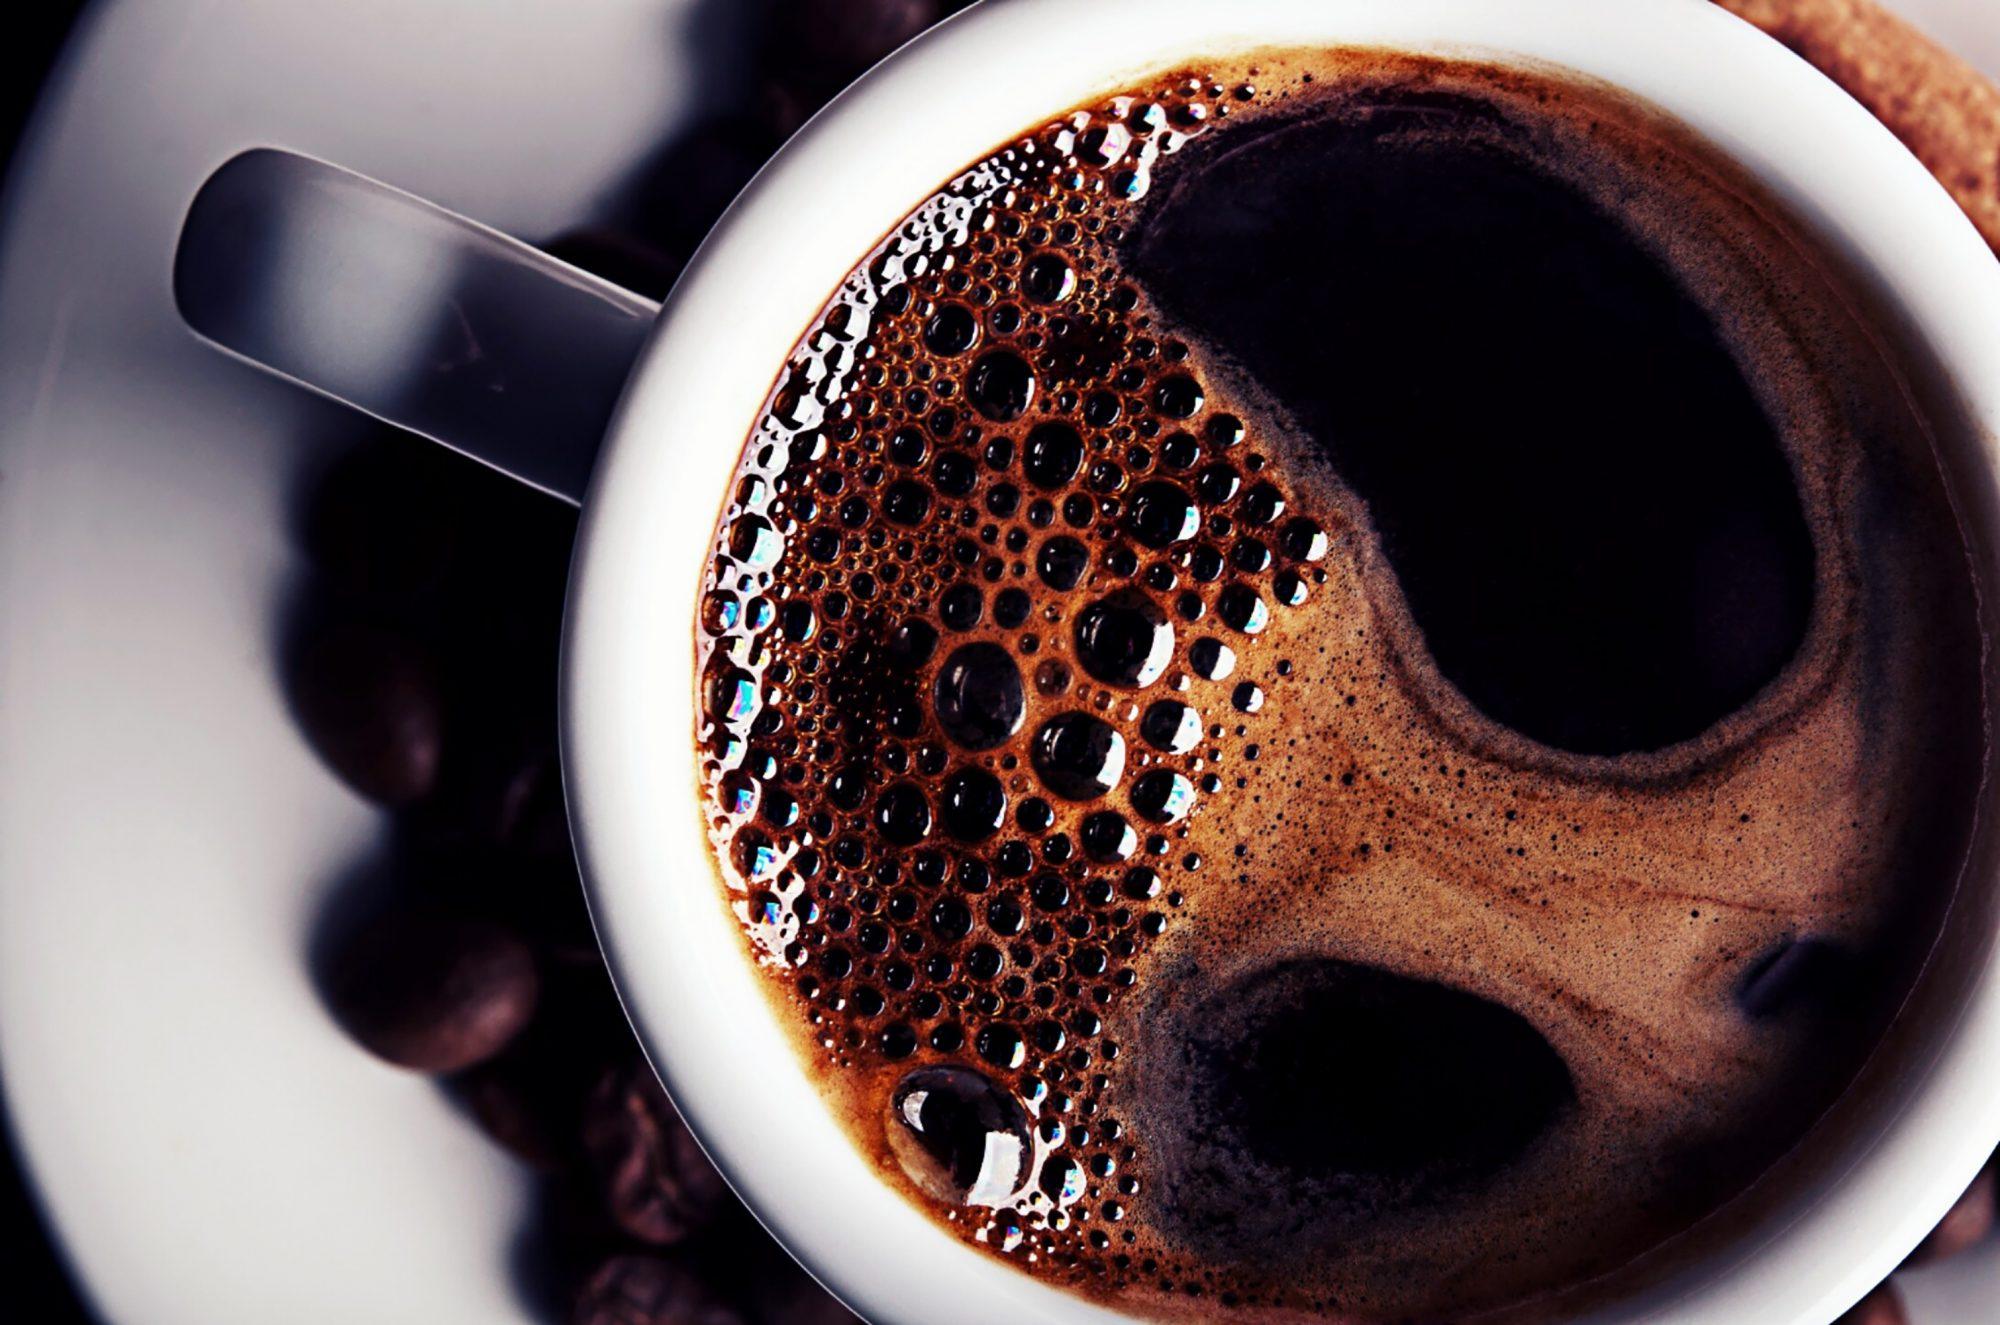 PRIMER PLANO DE LA TAZA DE CAFÉ